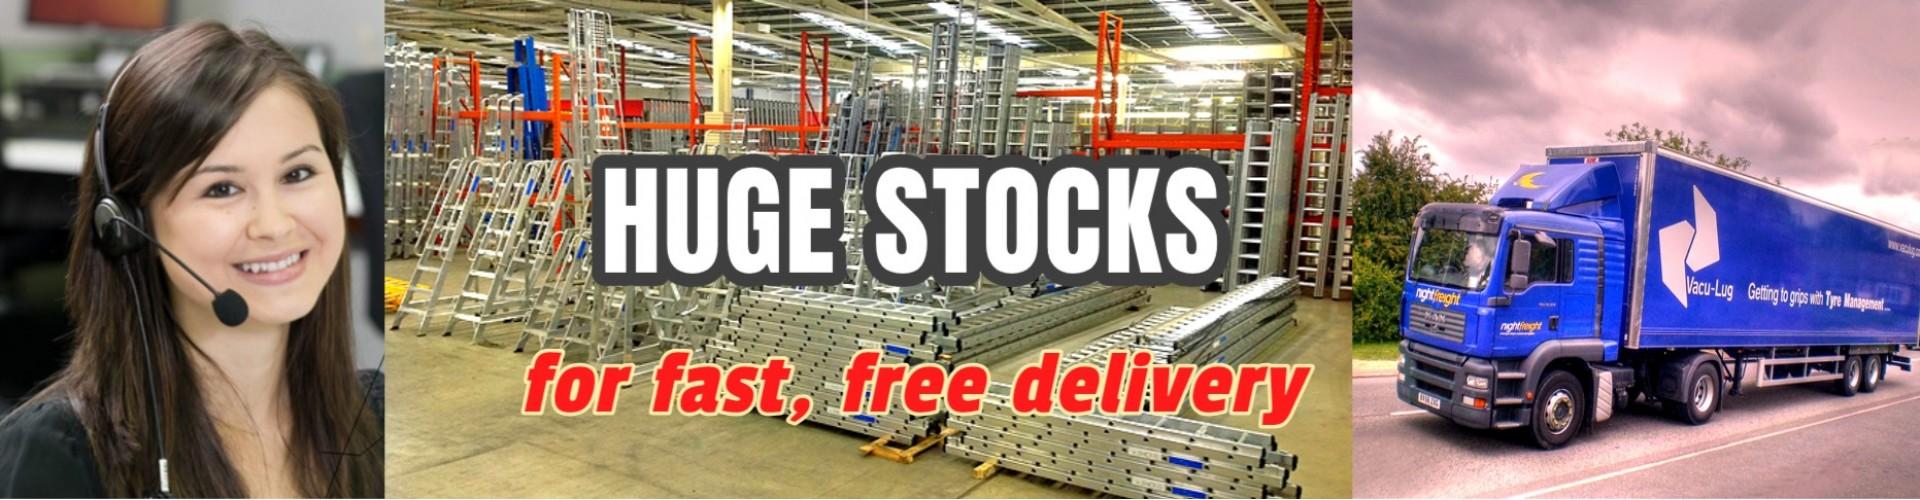 Huge Stocks